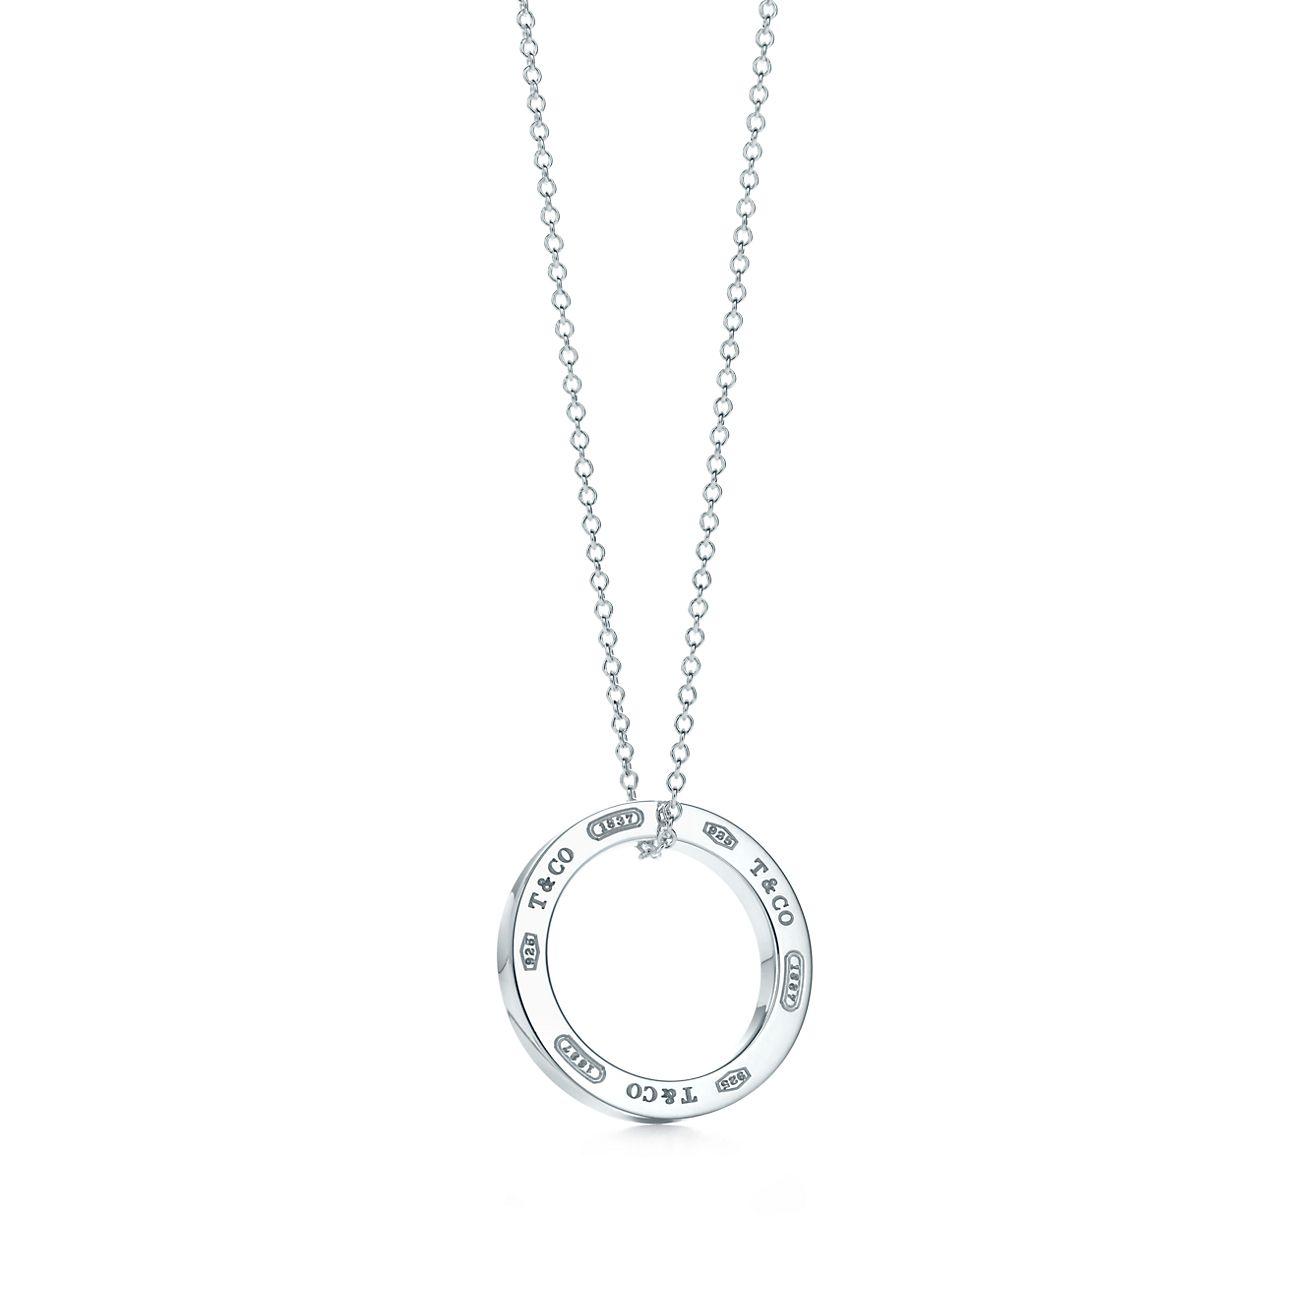 New Tiffany 1837™ Circle Pendant In Sterling Silver, Medium